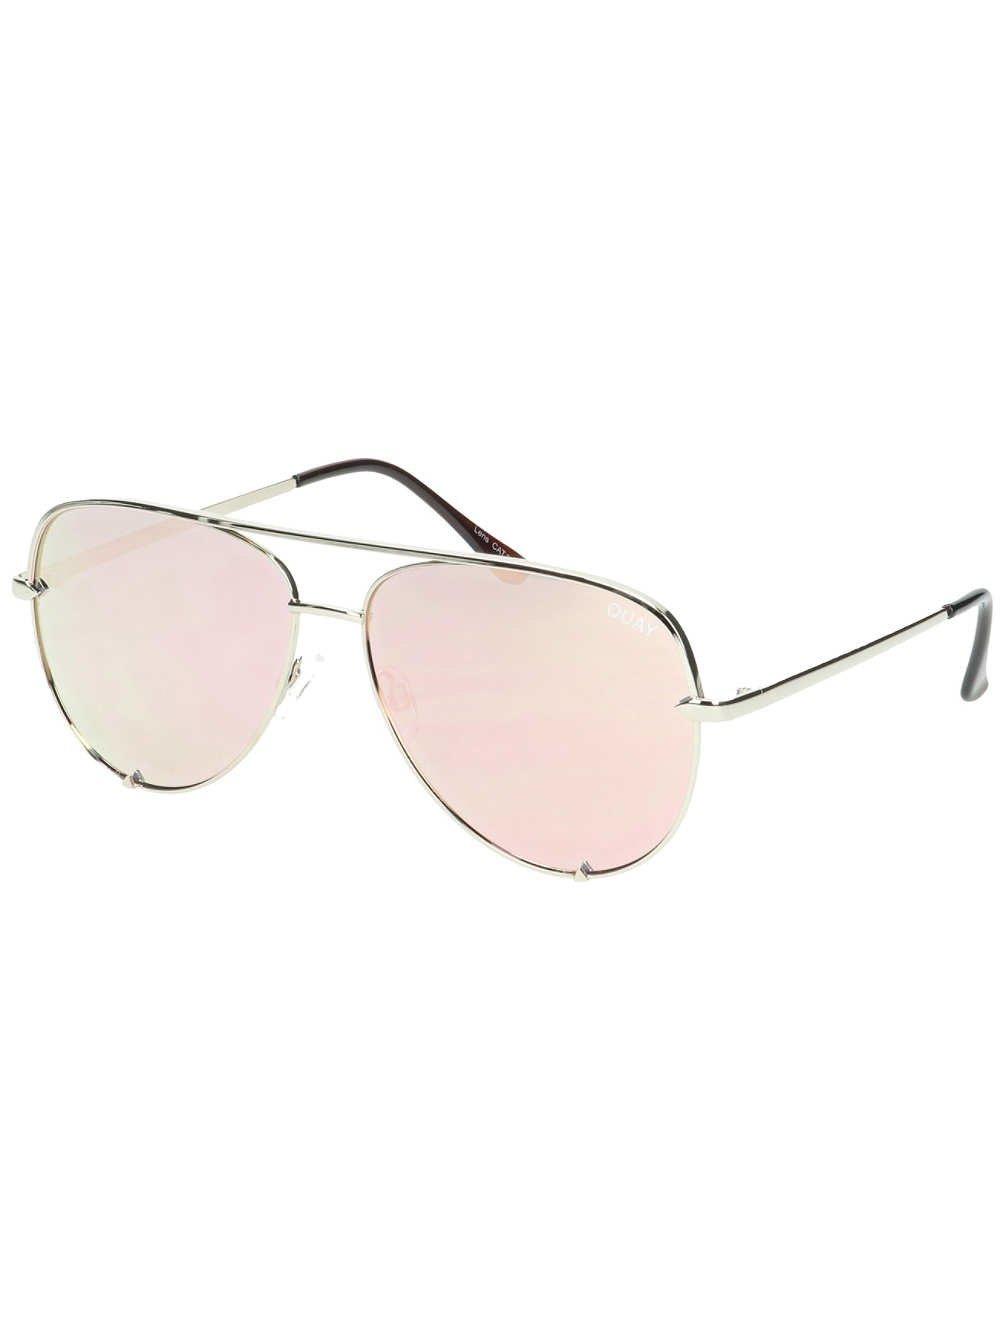 Quay Australia HIGH KEY Men's and Women's Sunglasses Classic Oversized Aviator - Gold by Quay Australia